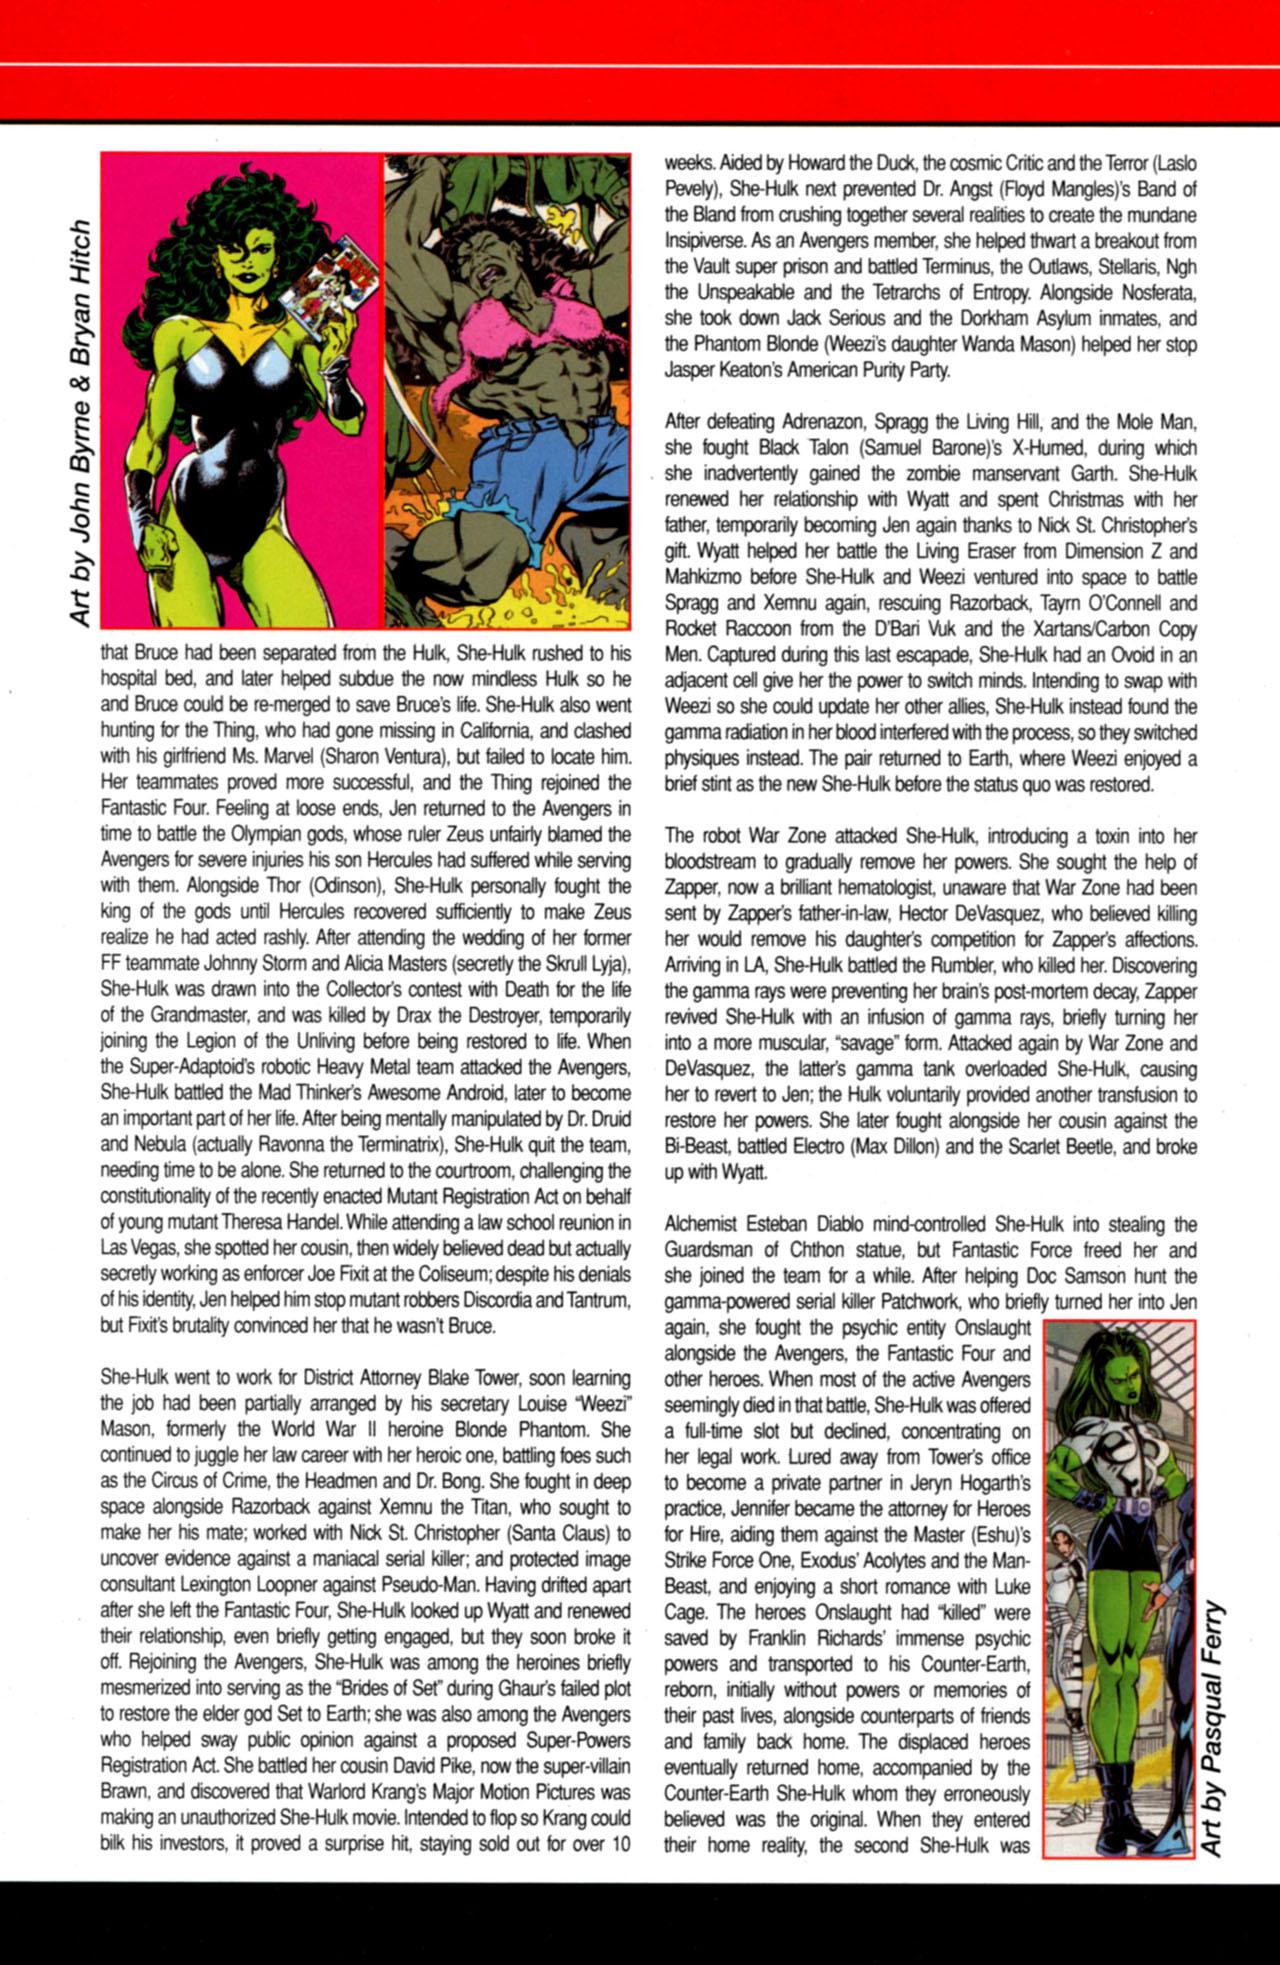 Read online She-Hulks comic -  Issue #1 - 26